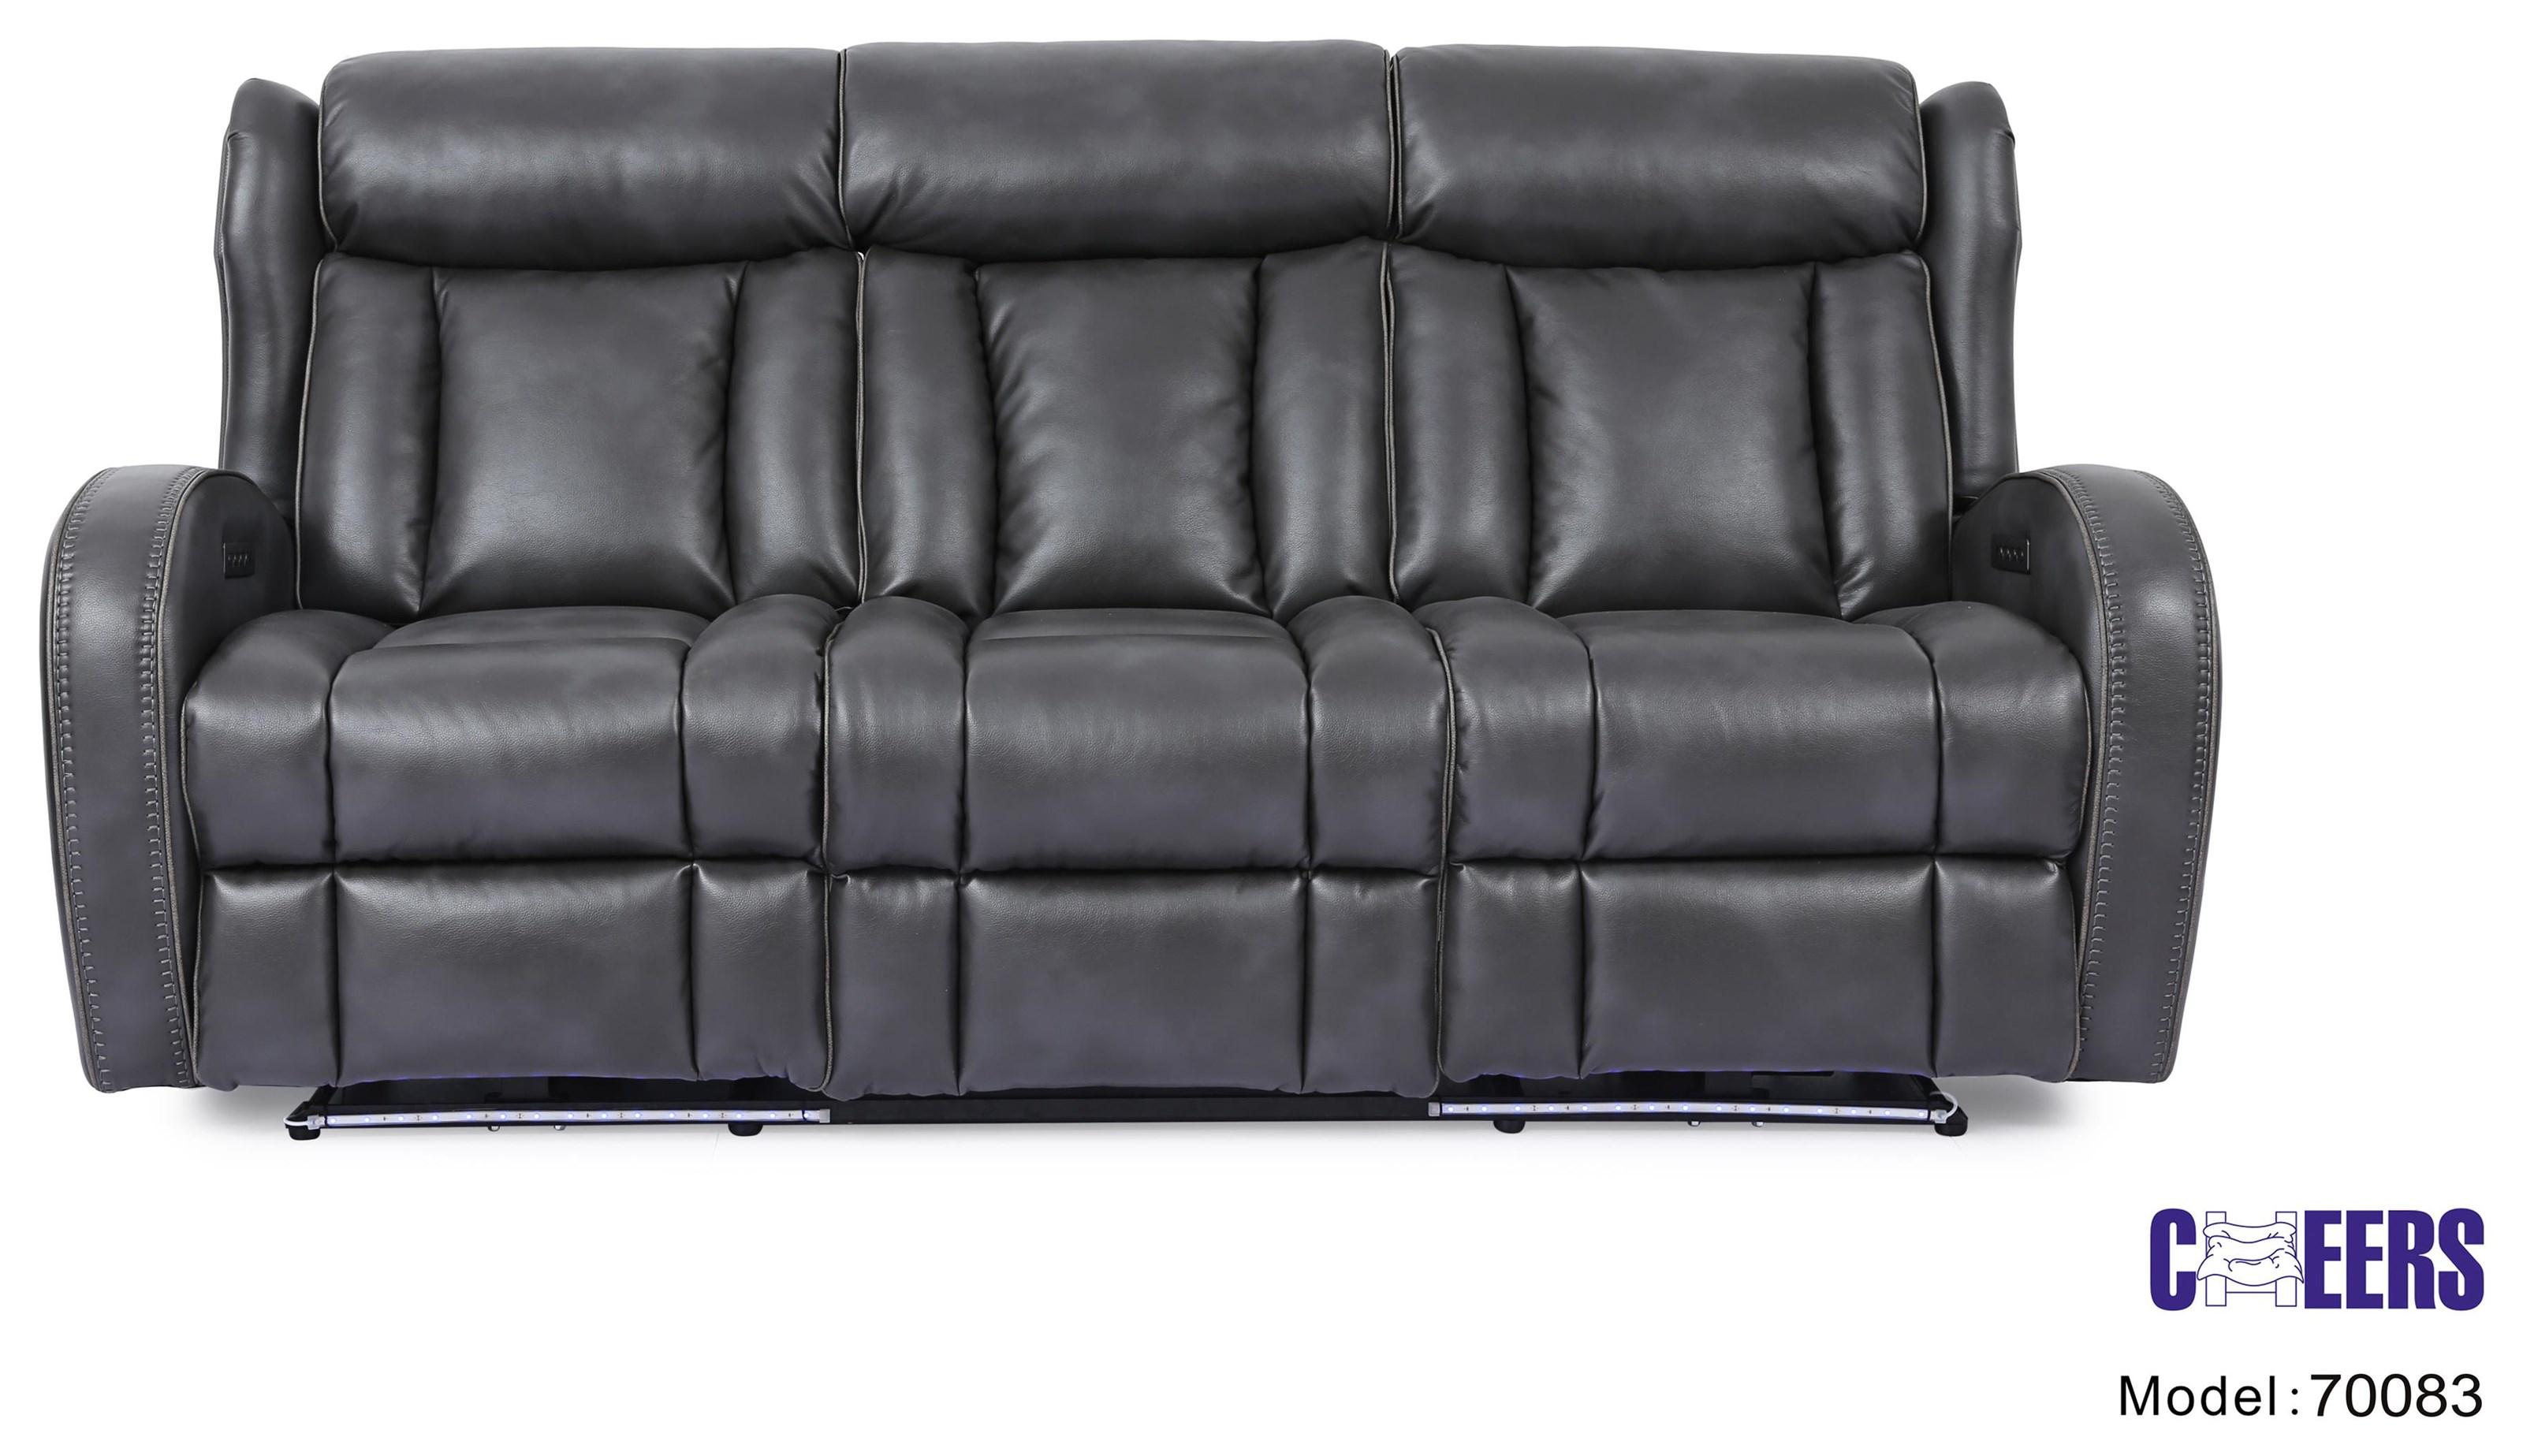 Ent Power Head Sofa w/ Lights